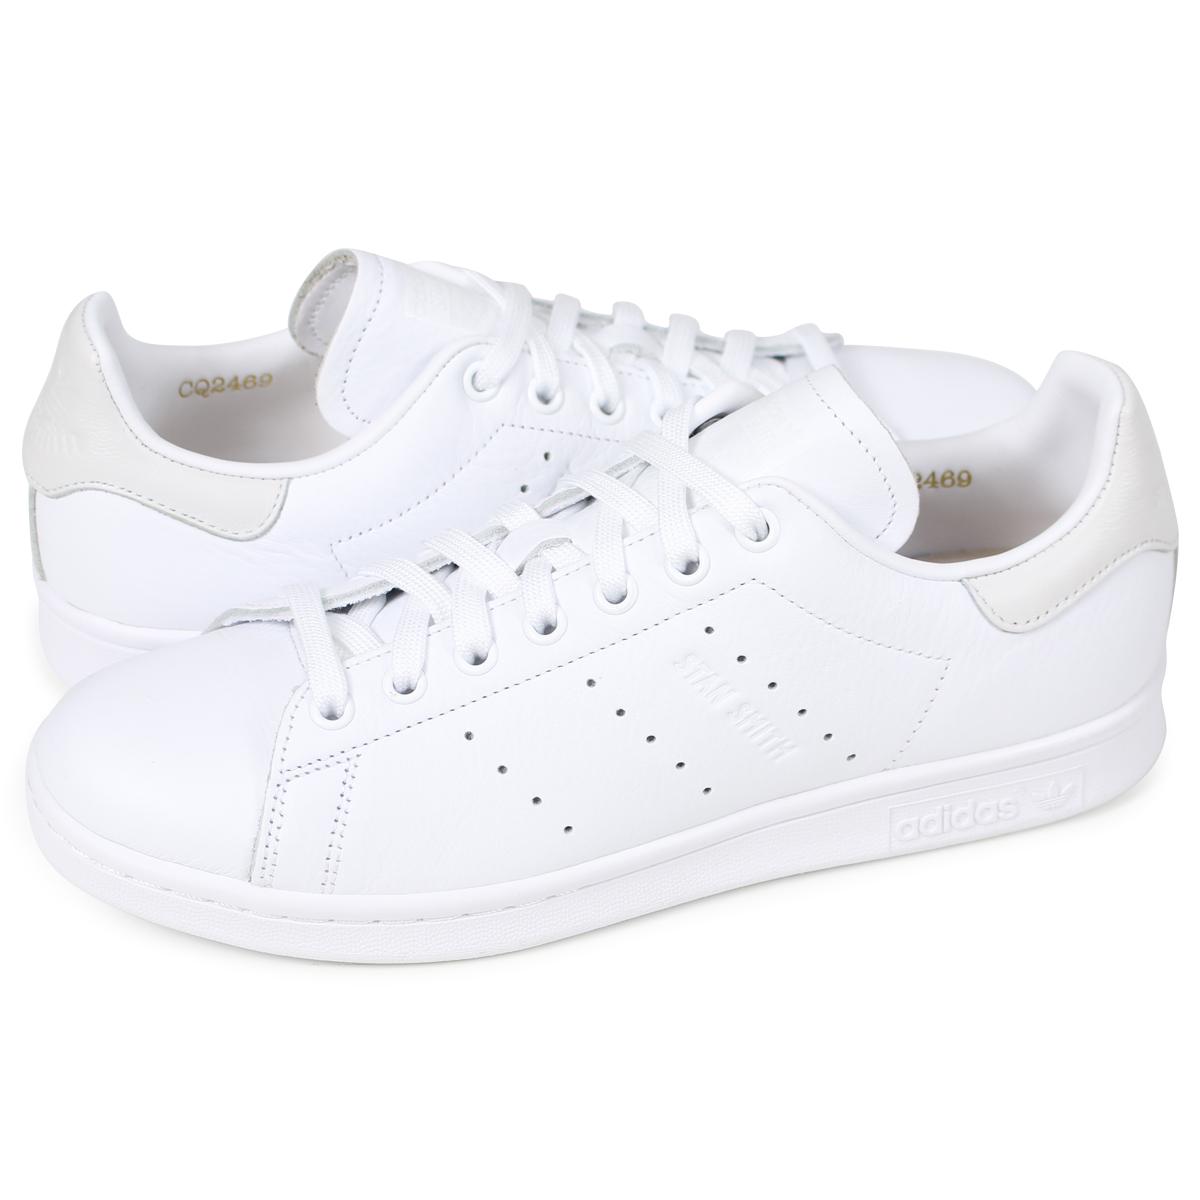 sports shoes 42e22 a134f adidas Originals STAN SMITH Adidas Stan Smith sneakers men gap Dis CQ2469  white originals [4/17 Shinnyu load]